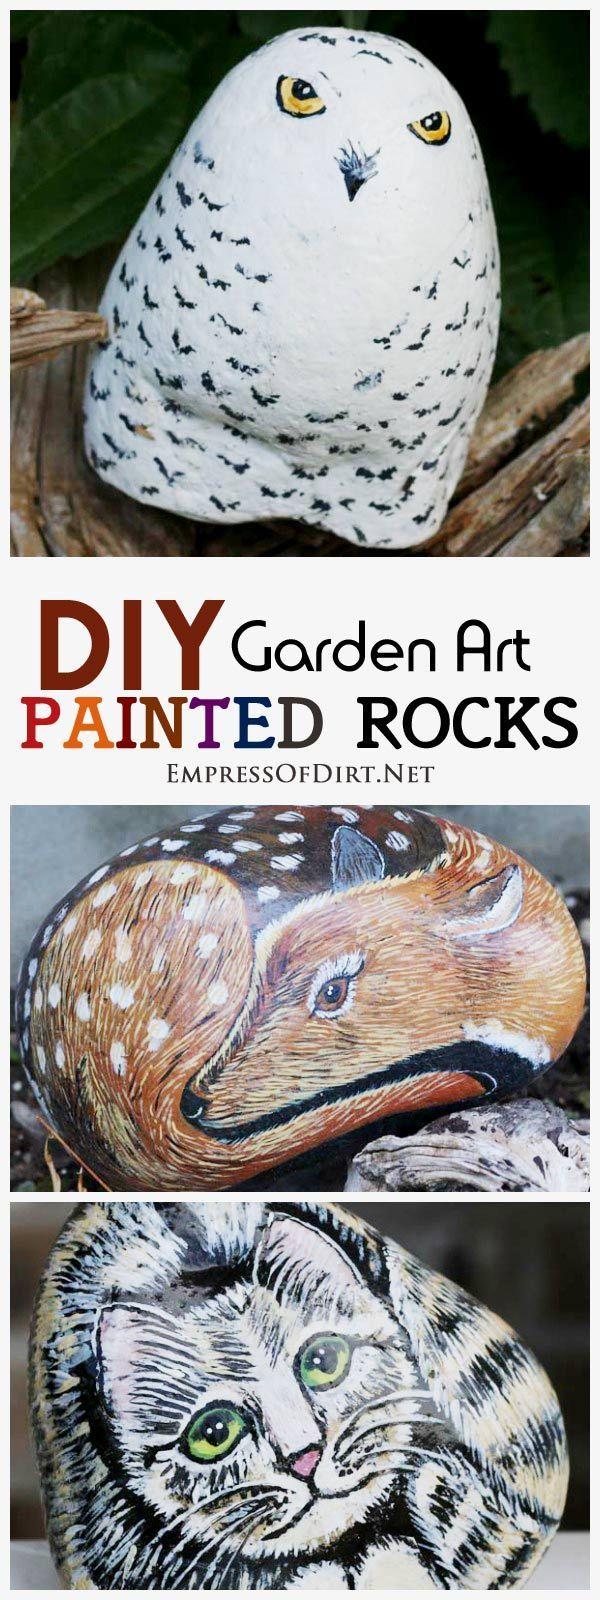 Best 25 garden deco ideas on pinterest garden - Can you use interior paint outdoors ...